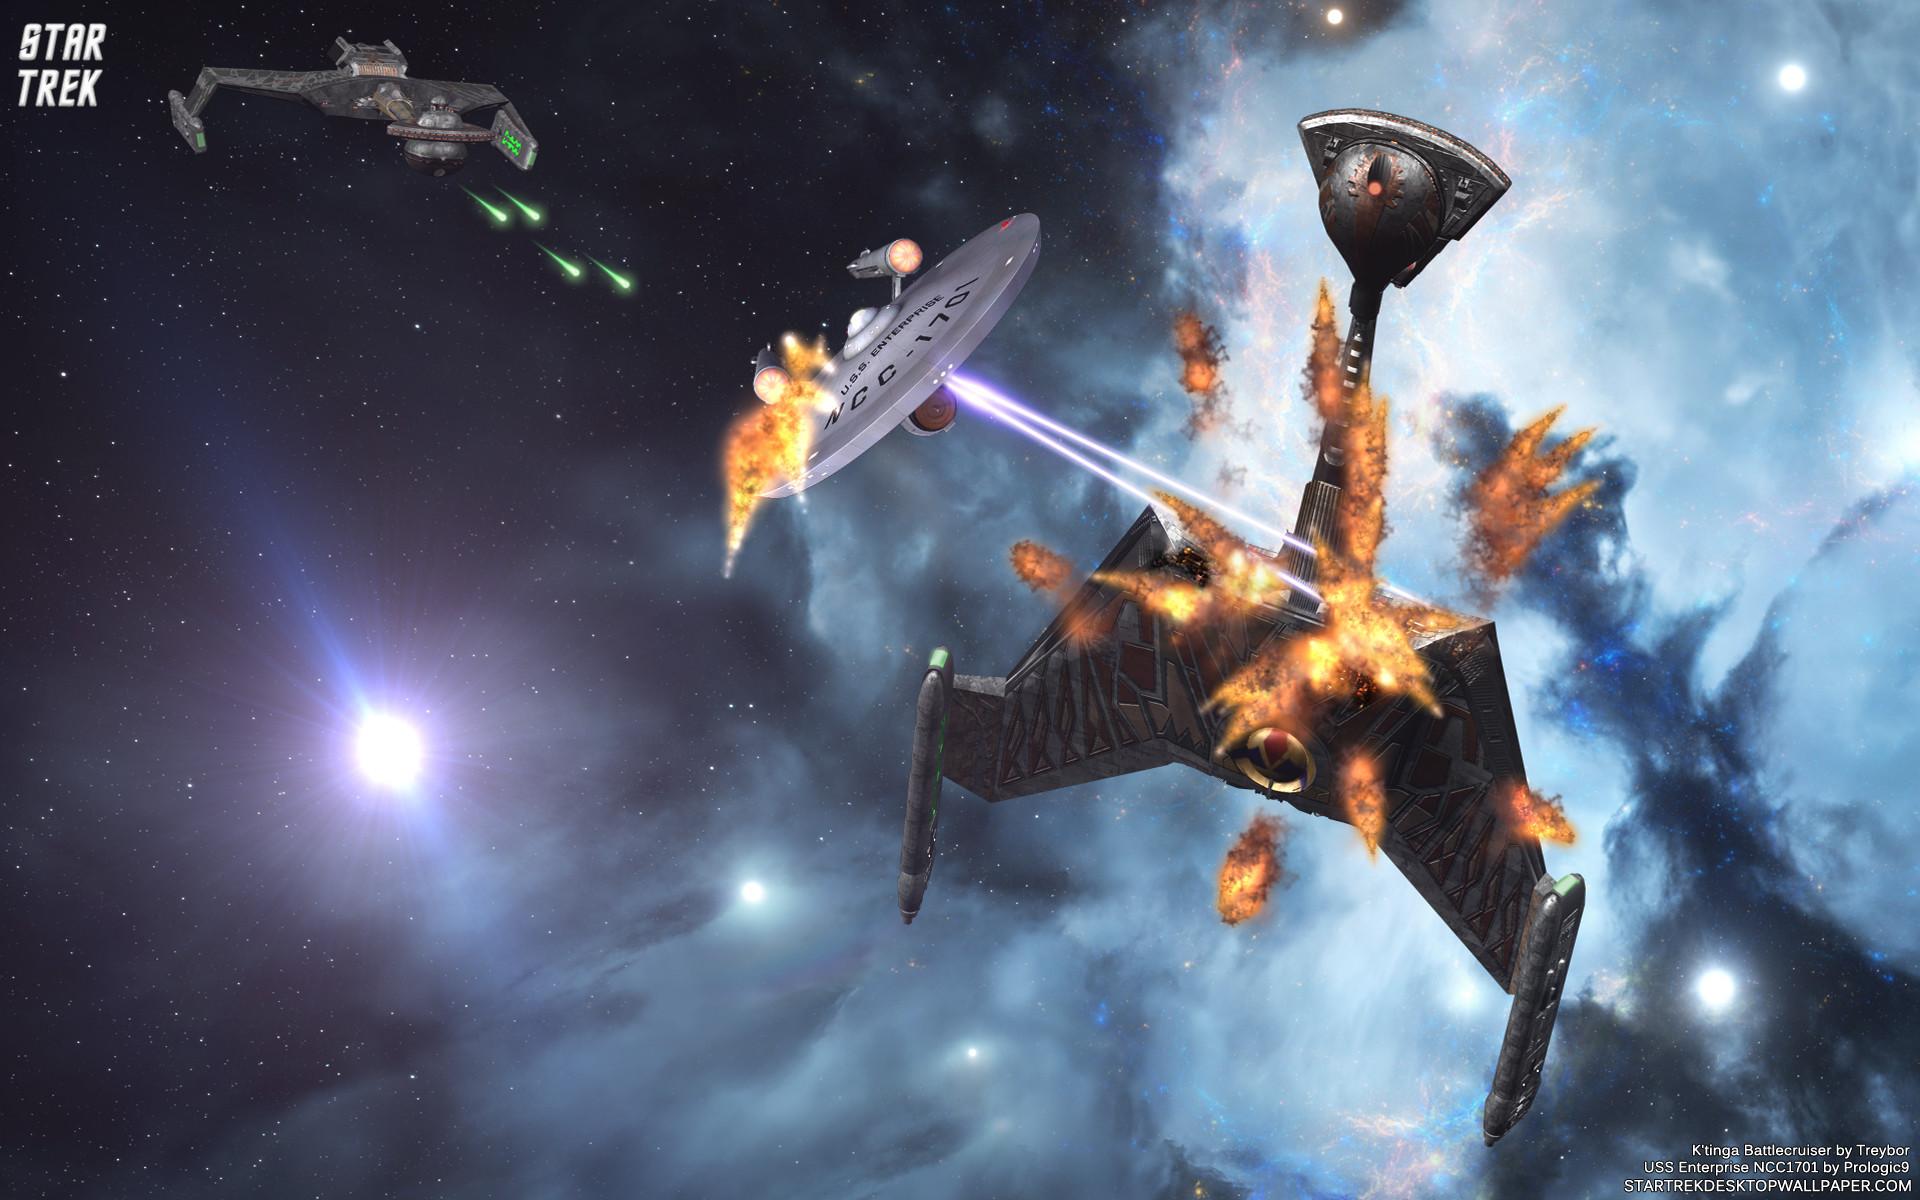 Star Trek Space Battle USS Enterprise 1701 Versus K'tinga Battlecruiser.  Free Star Trek